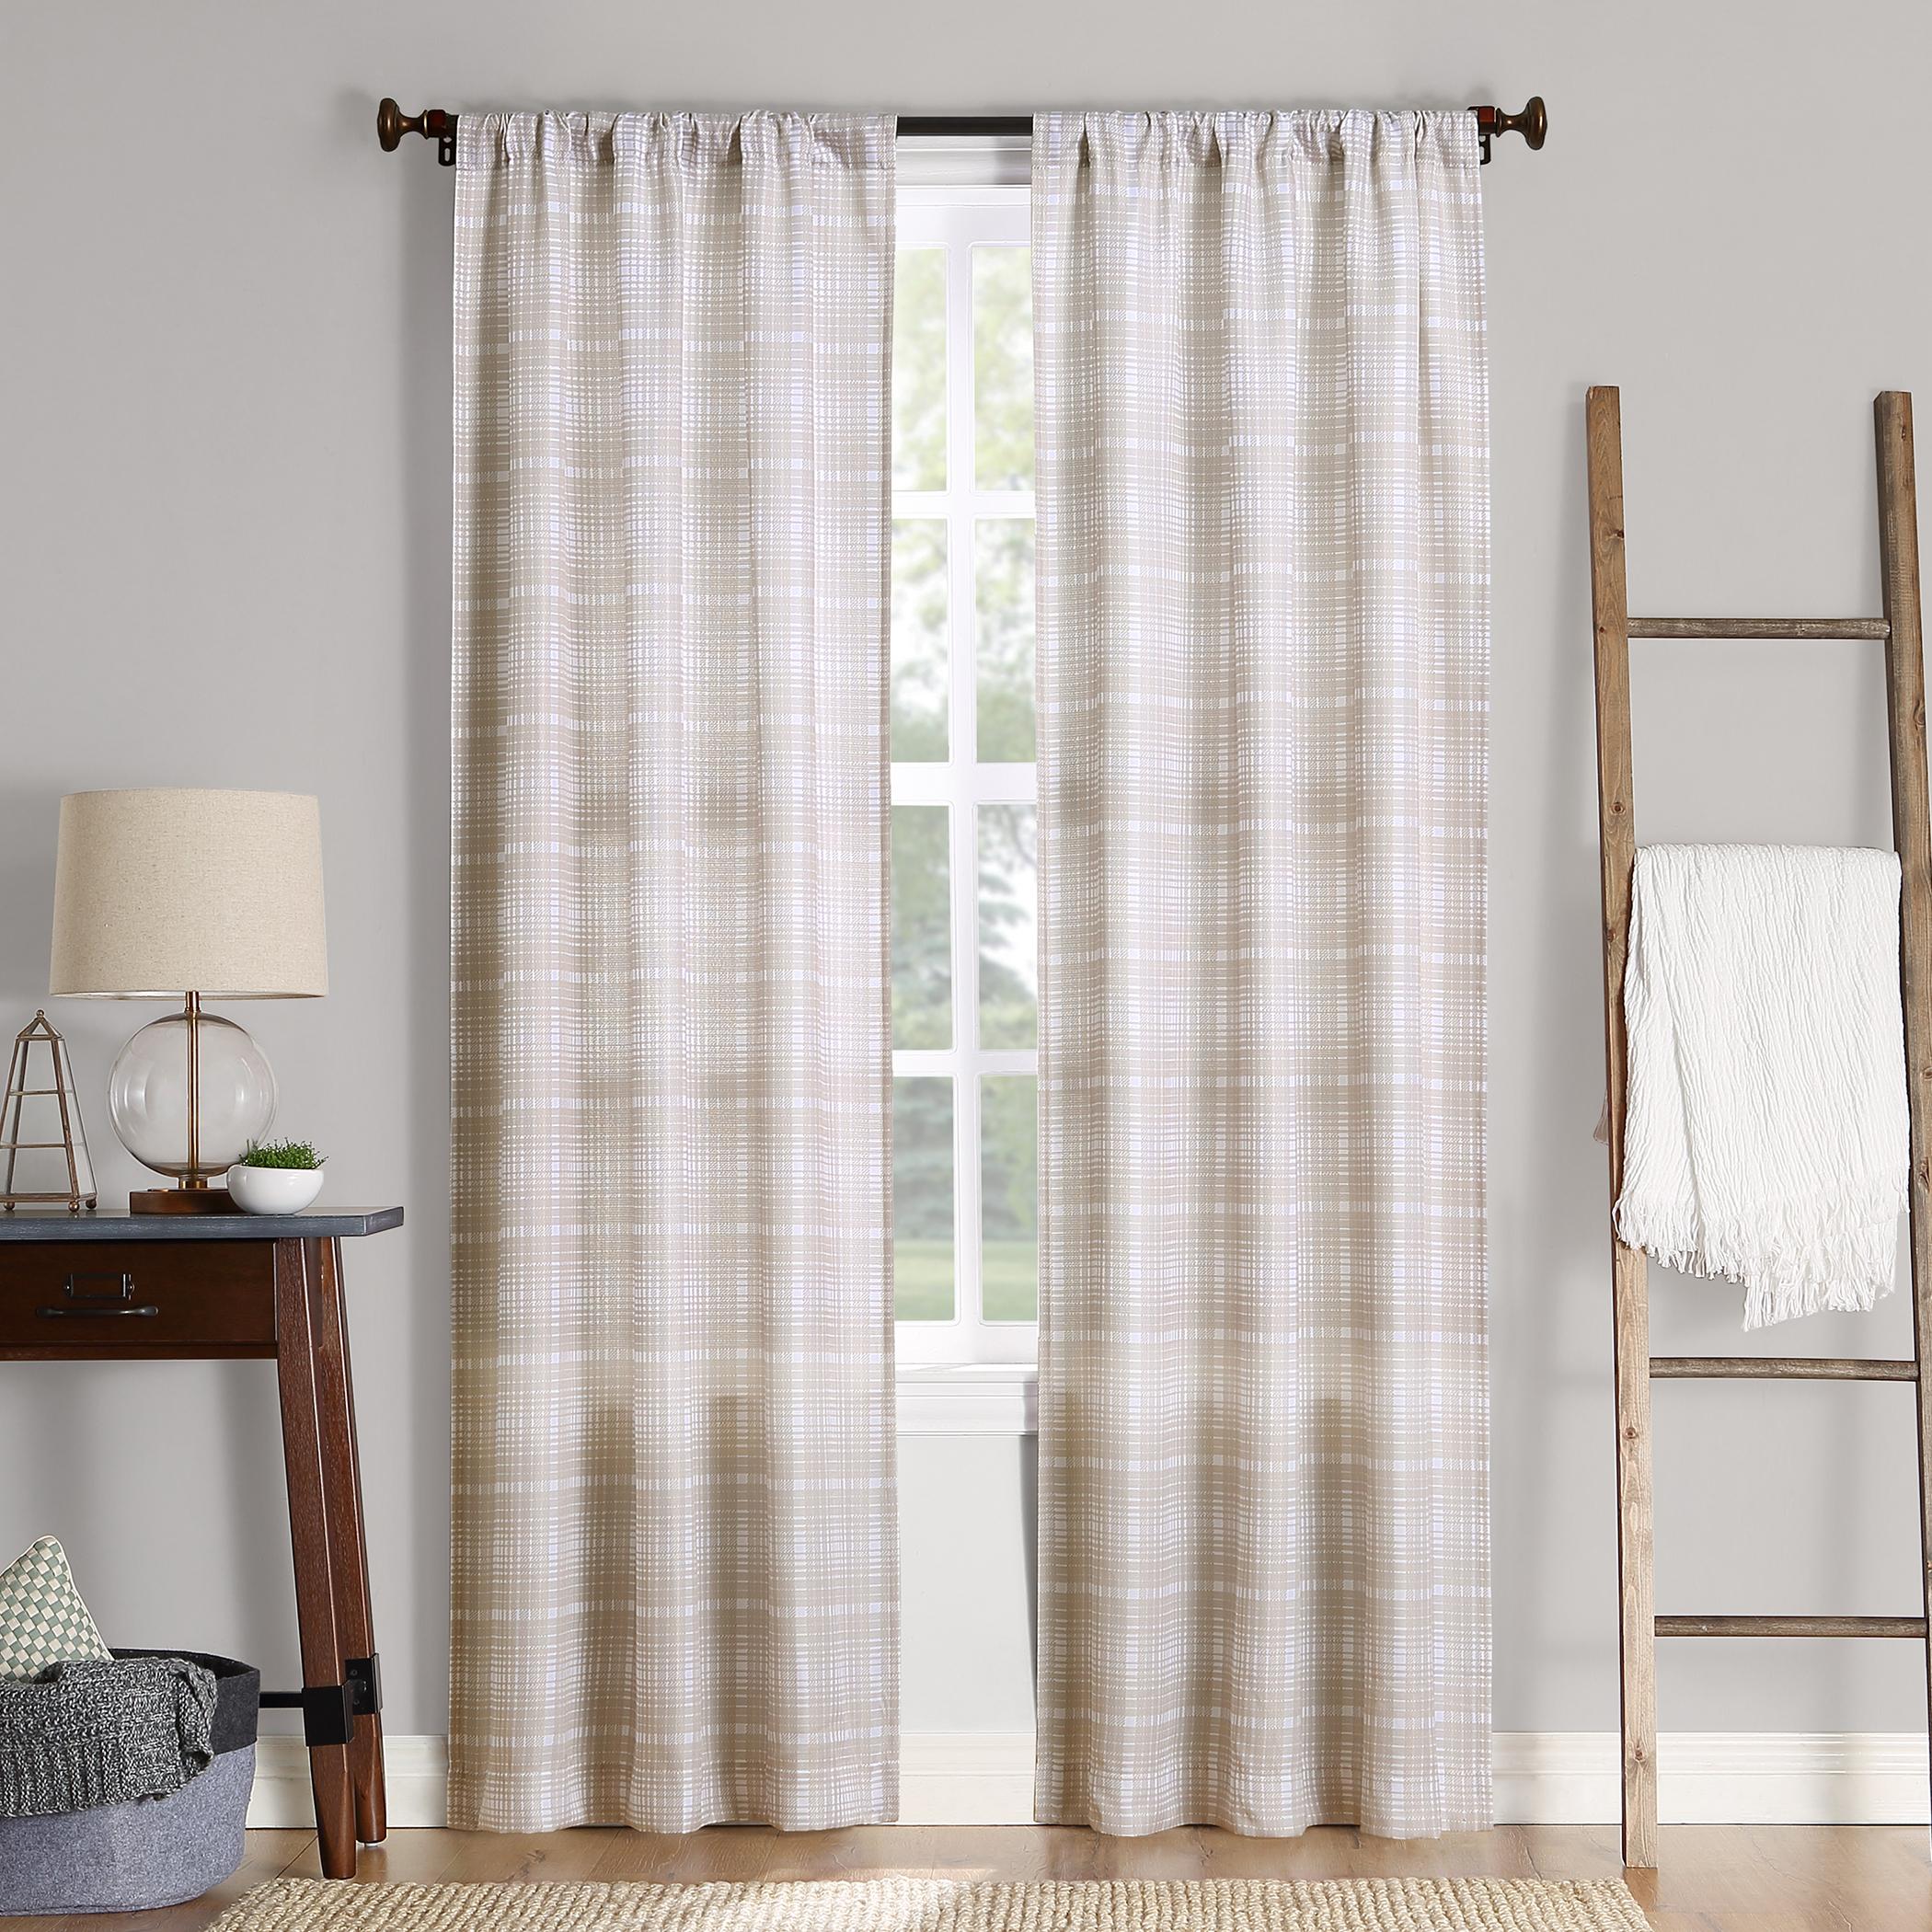 No. 918 Sebastian Plaid Semi-Sheer Rod Pocket Curtain Panel